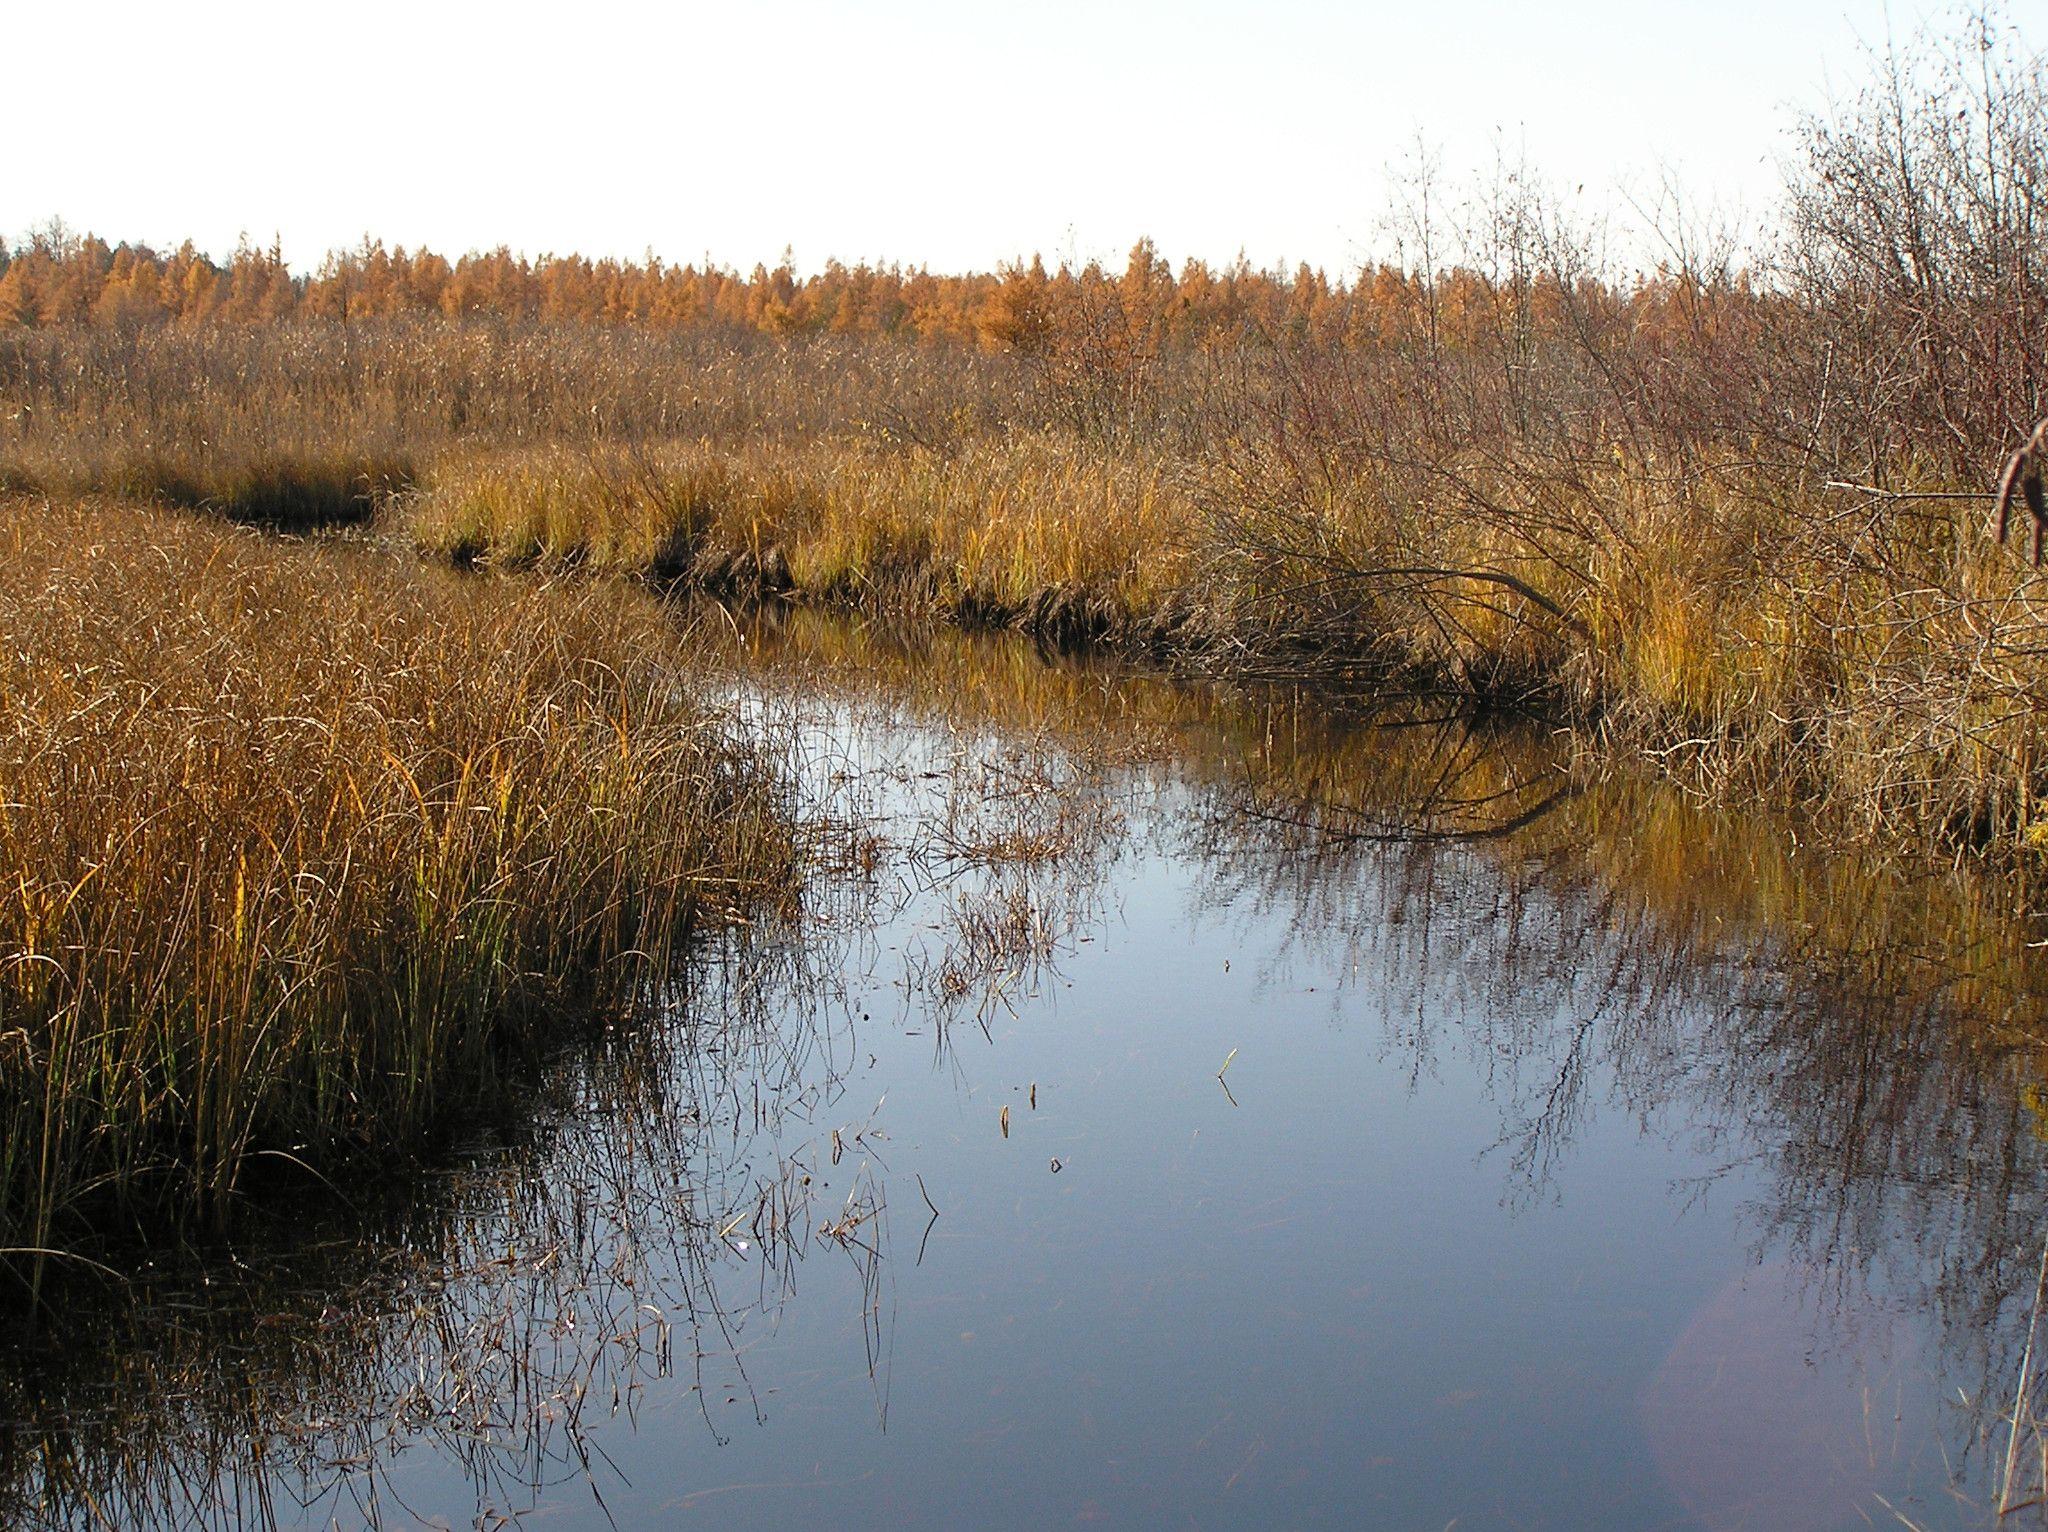 Noq_Wetland_downstream.JPG